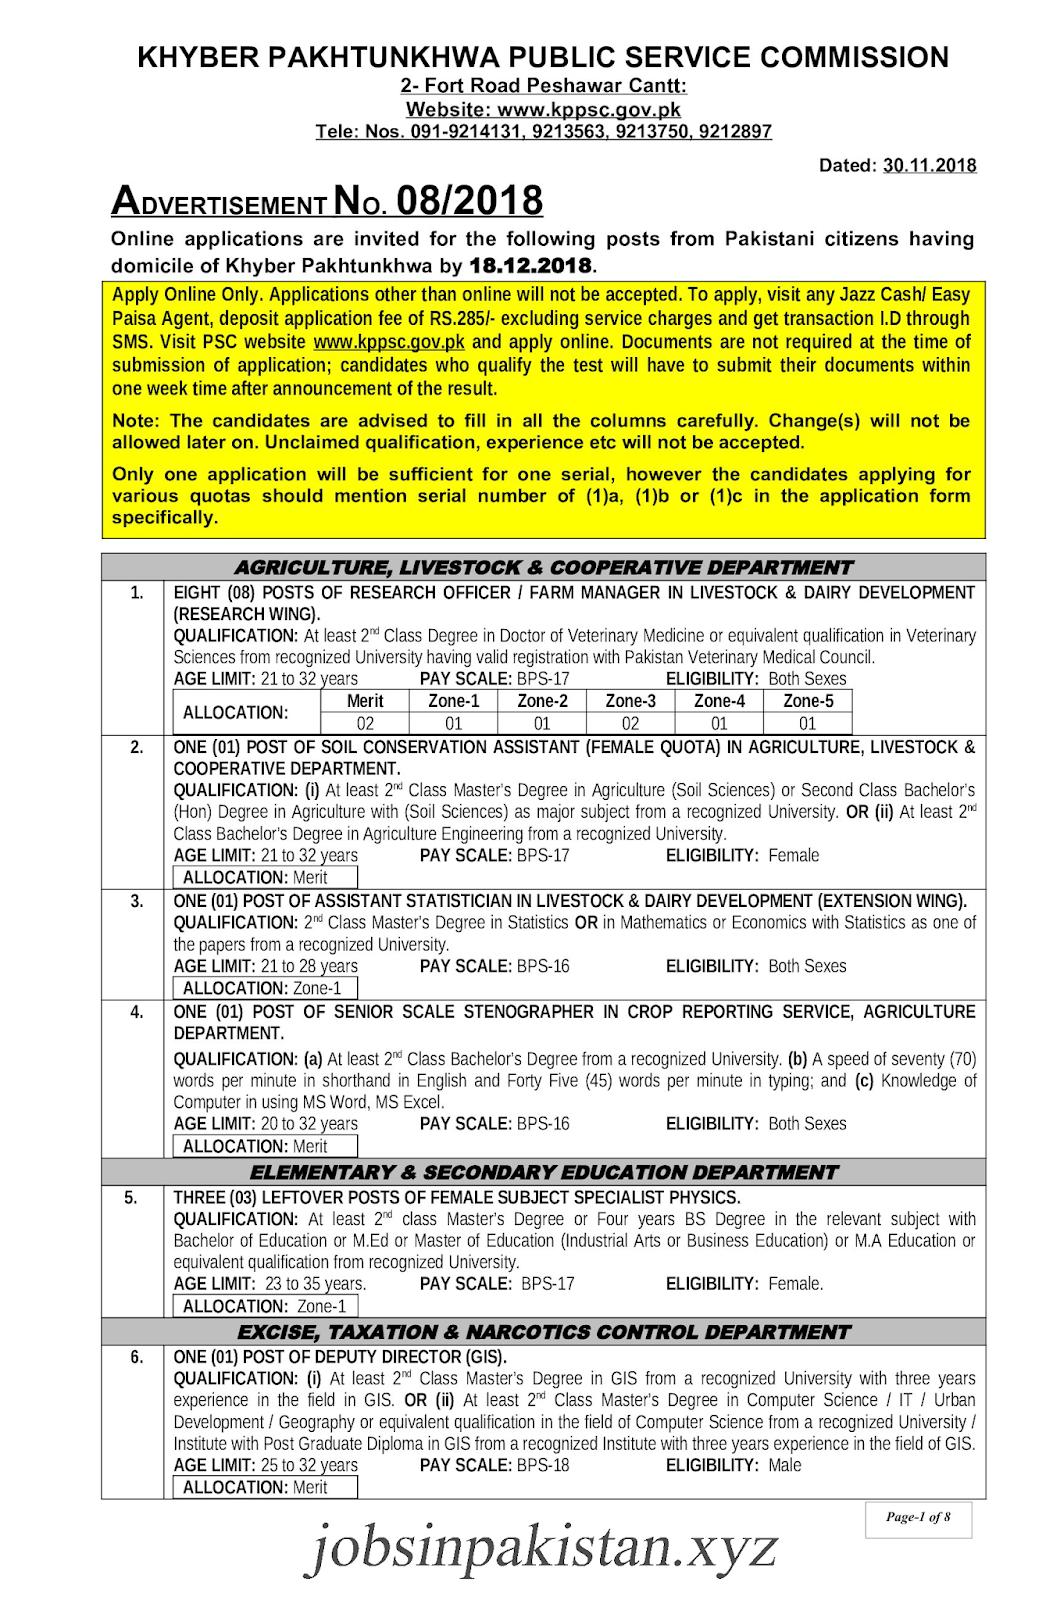 KPPSC Advertisement 08/2018 Page No. 1/8